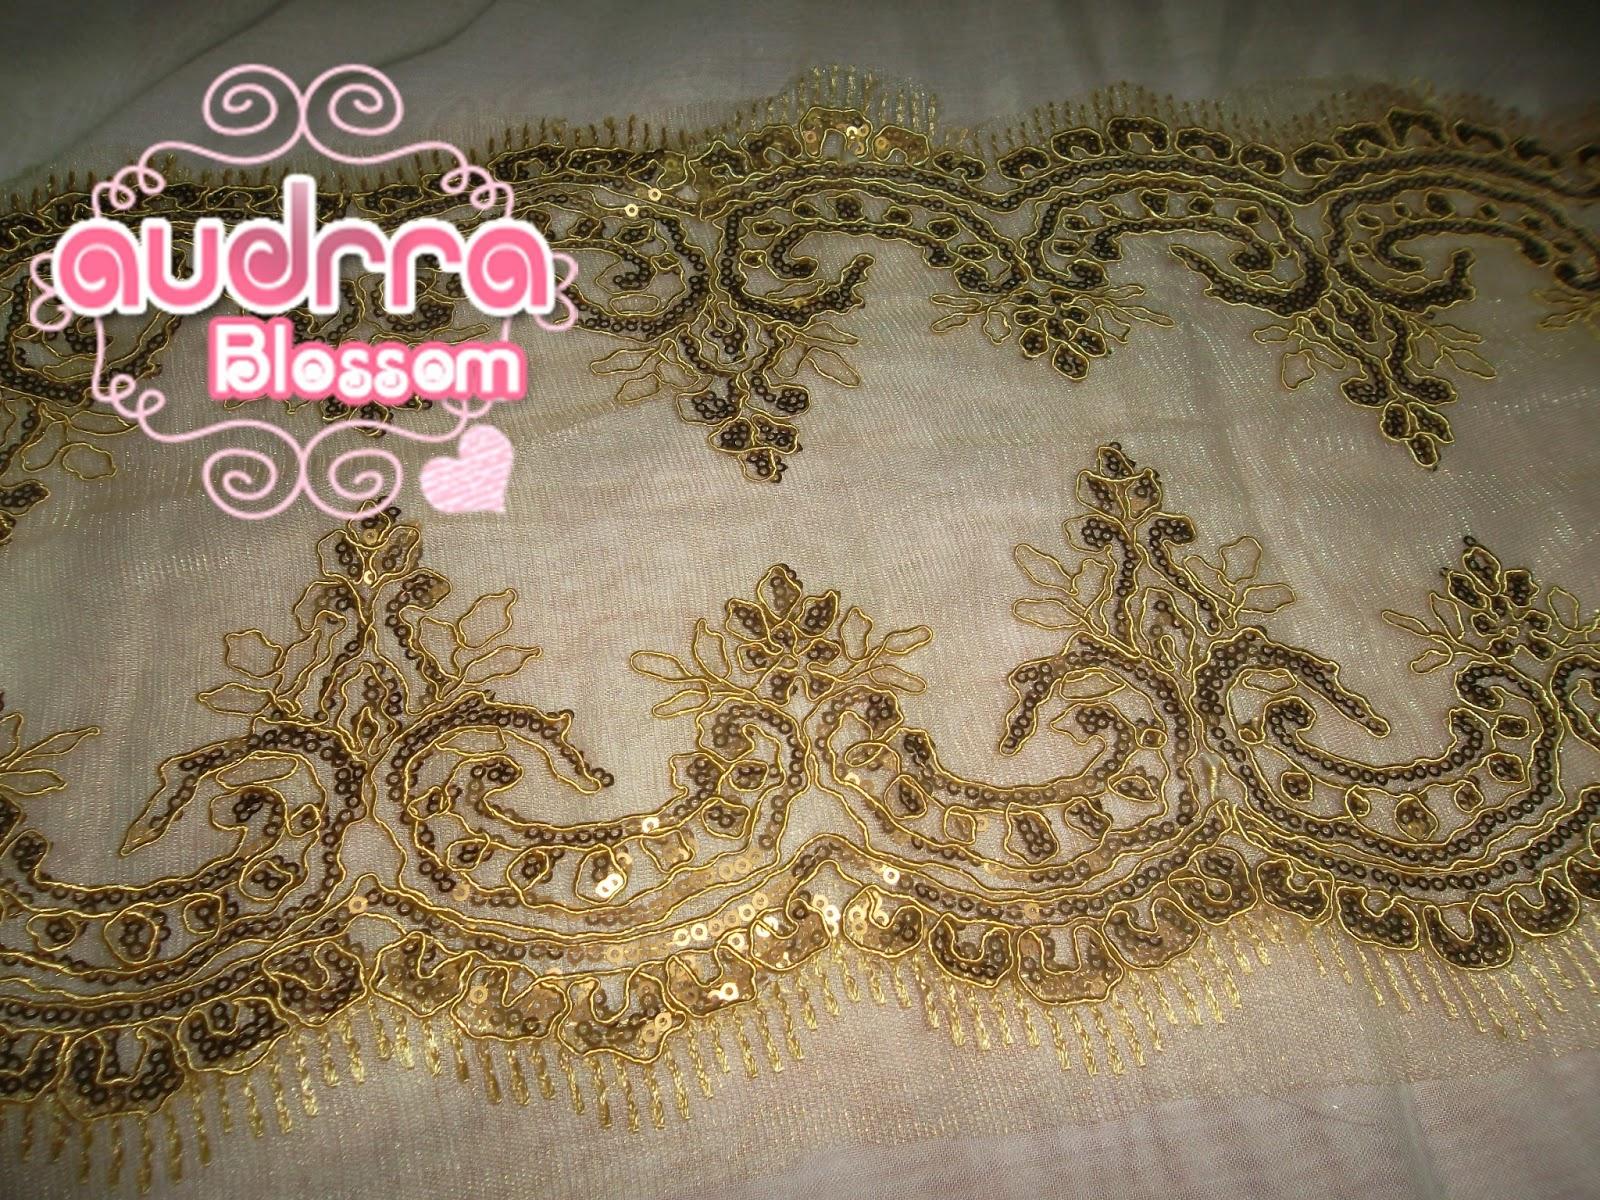 Border lace cantik warna soft gold RM 19 semeter.